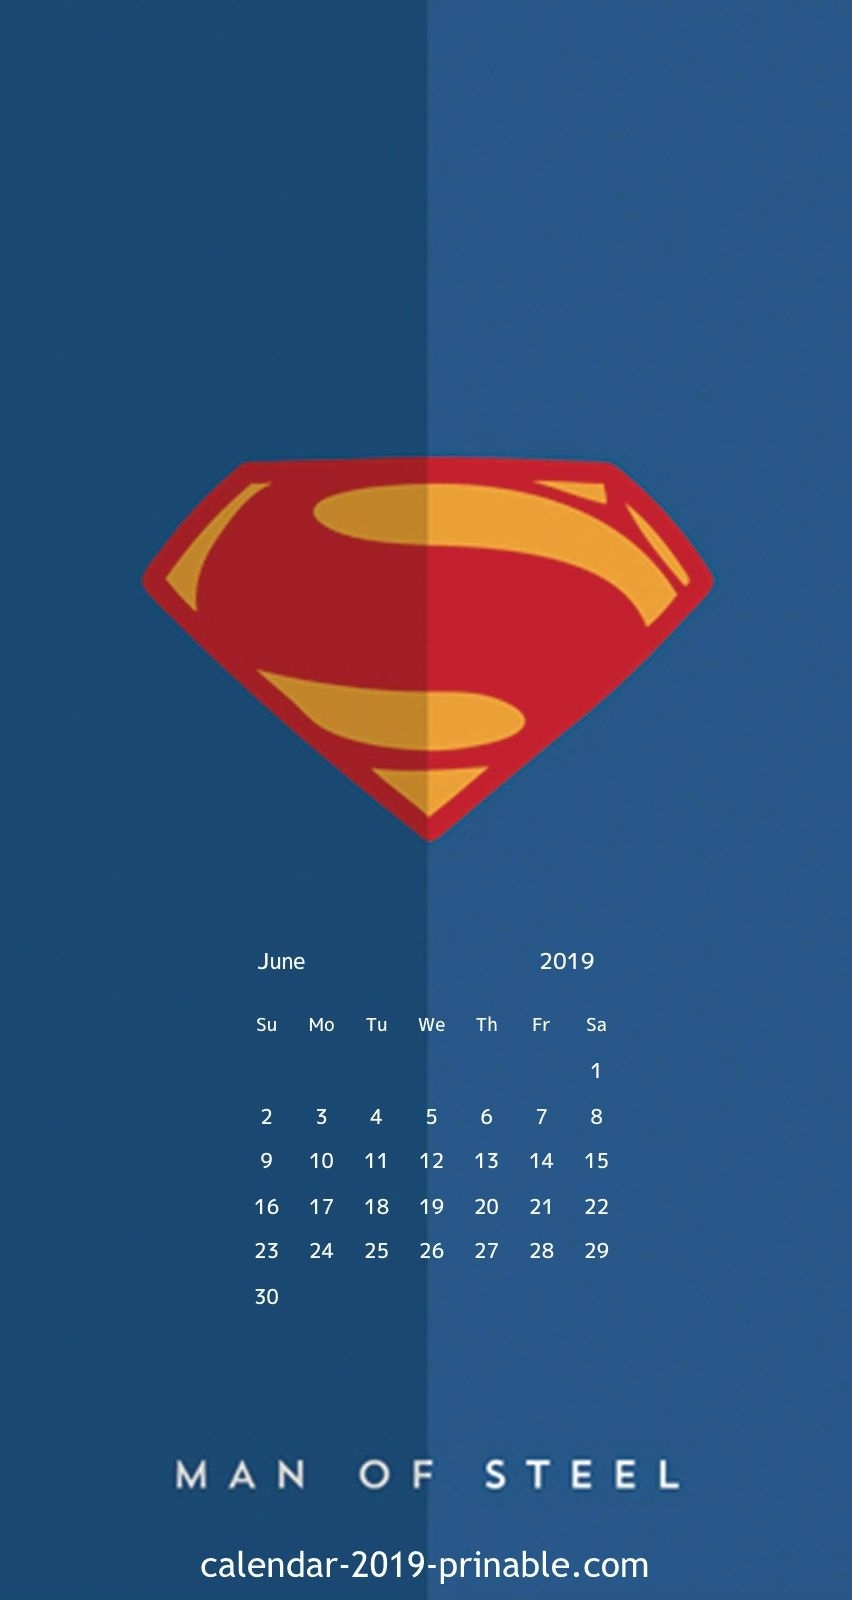 June 2019 Iphone Calendar Wallpaper | 2019 Calendars In 2019